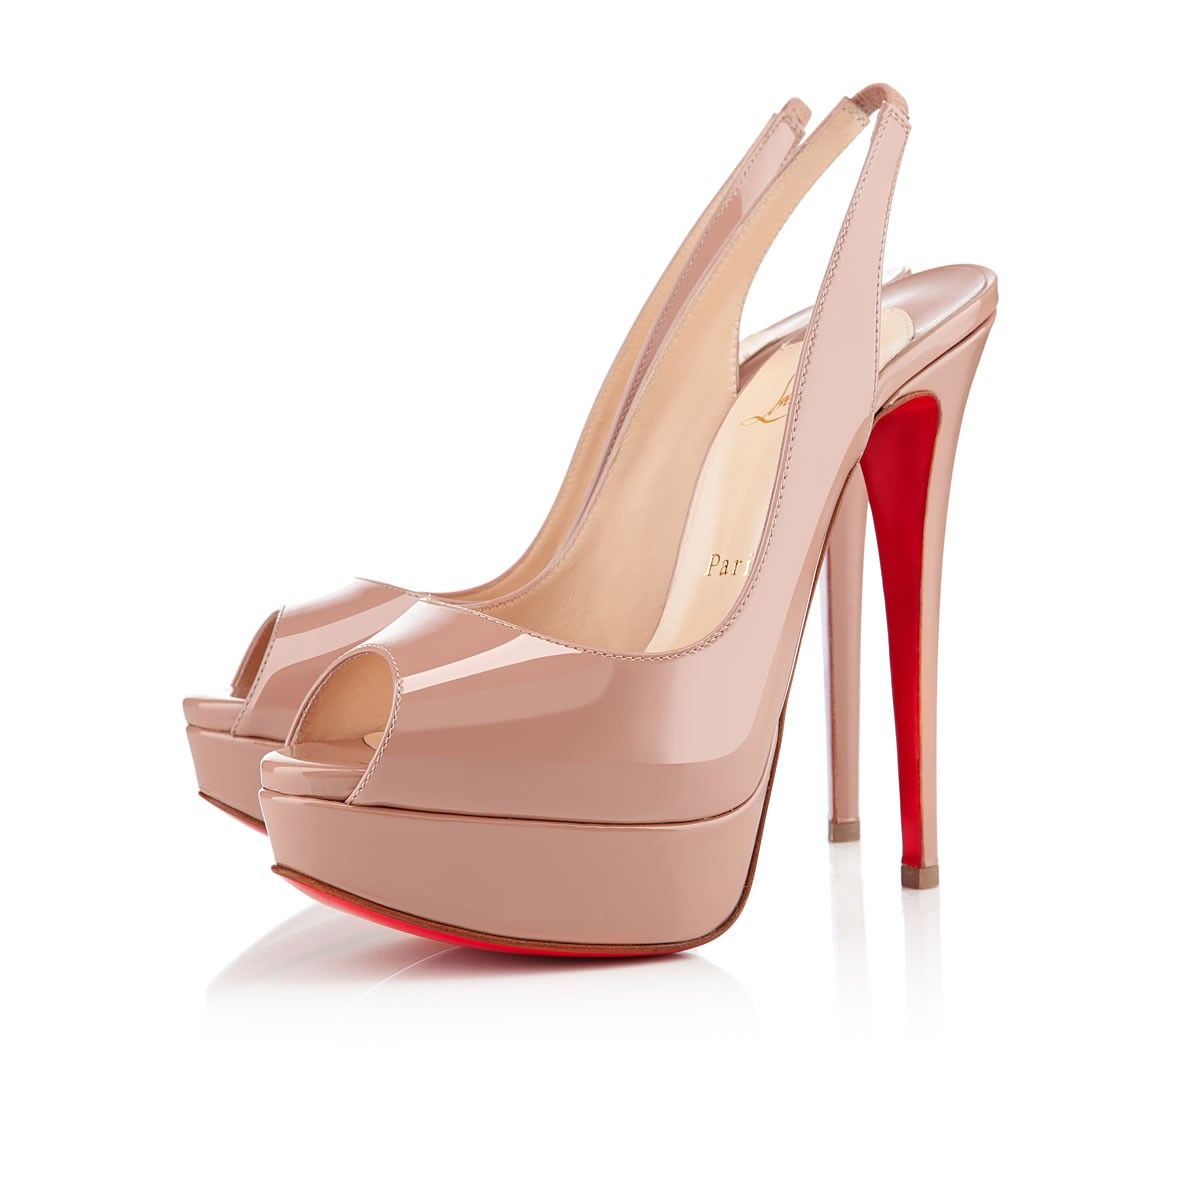 8547da82f14 LADY PEEP SLING PATENT CALF 150 Nude Patent Calfskin - Women Shoes ...